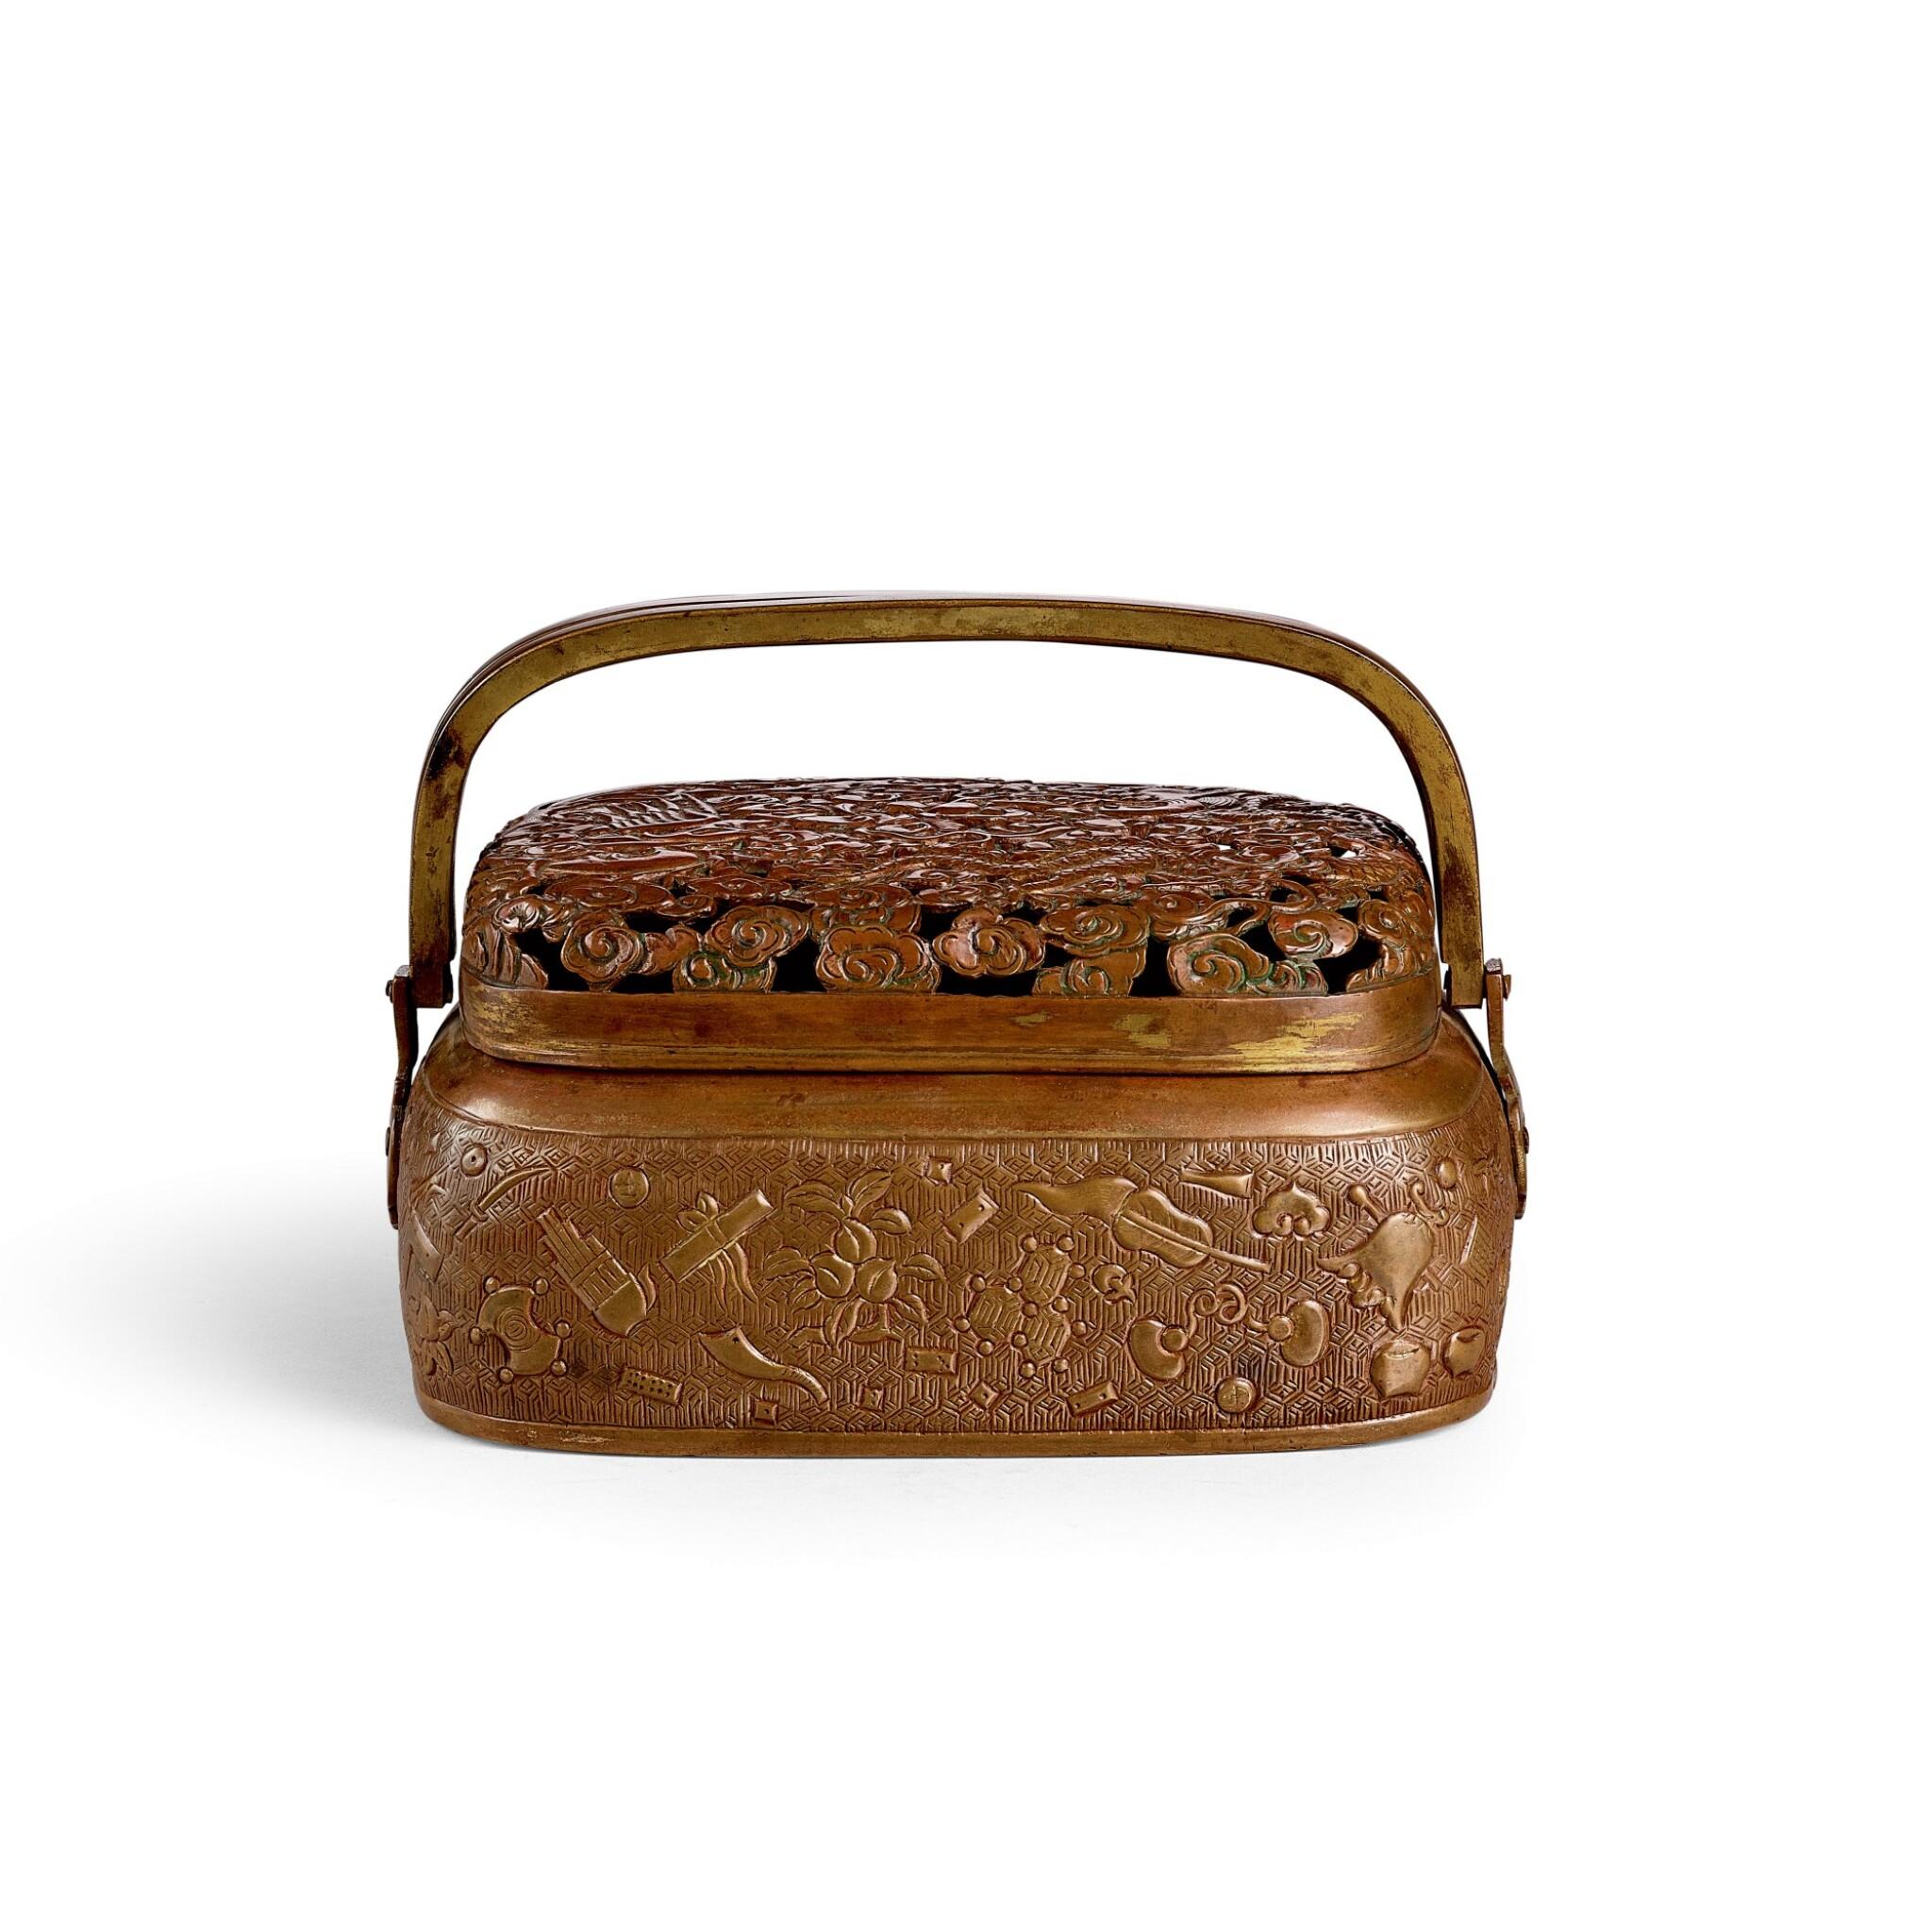 View full screen - View 1 of Lot 3677. A rare parcel-gilt copper alloy rectangular bronze handwarmer By Hu Wenming, Late Ming dynasty   明末 胡文明製局部鎏金銅鏤空祥雲龍鳳紋手爐 《胡文明製》款.